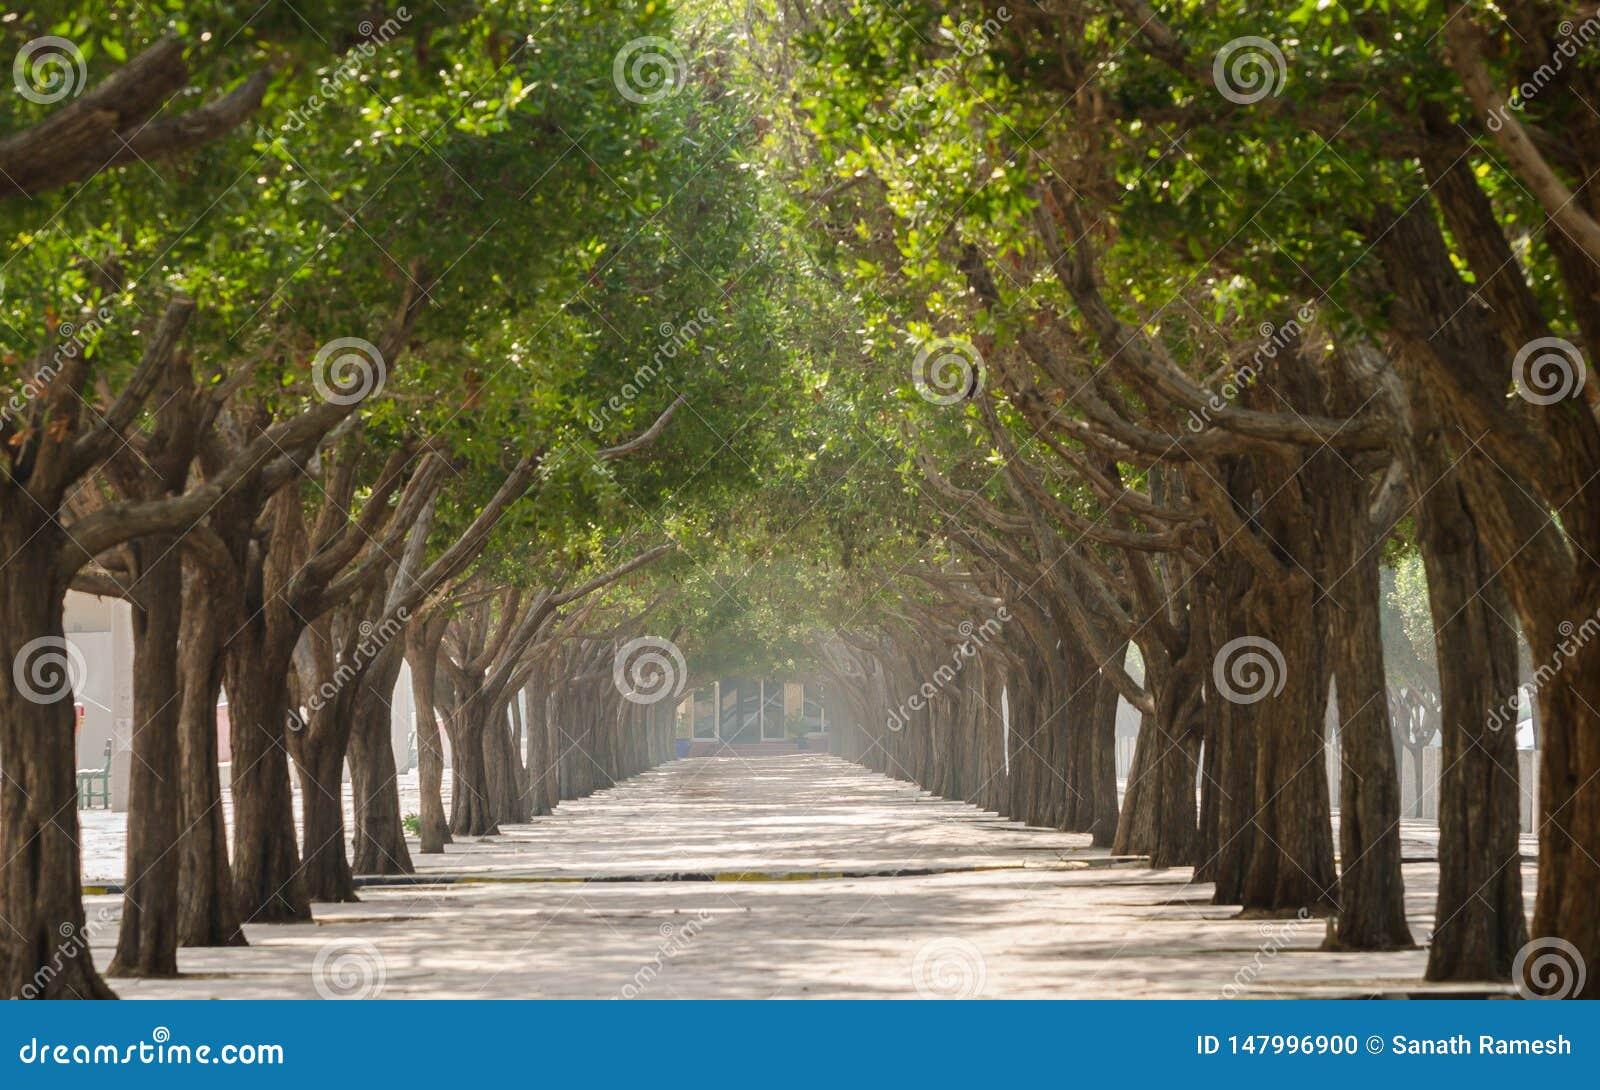 Дорожка с деревьями в симметрии на обеих сторонах